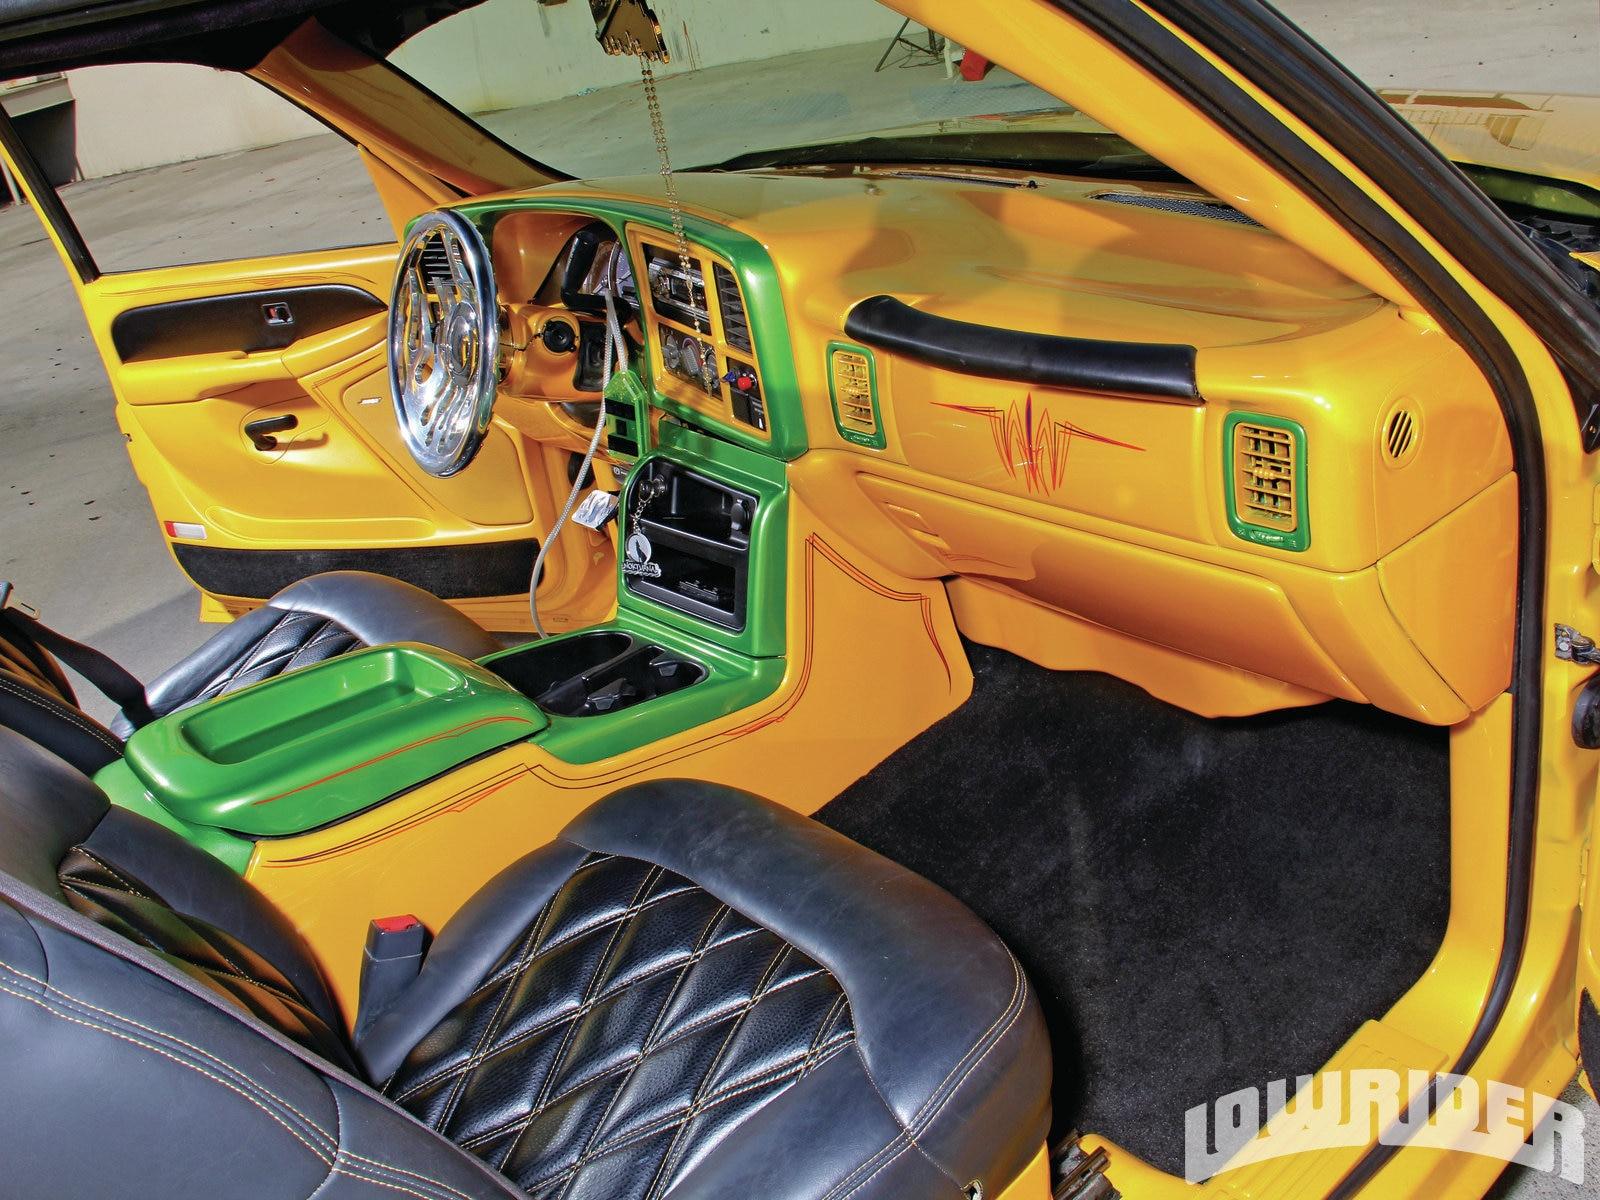 2001 Chevrolet Silverado - Lowrider Magazine